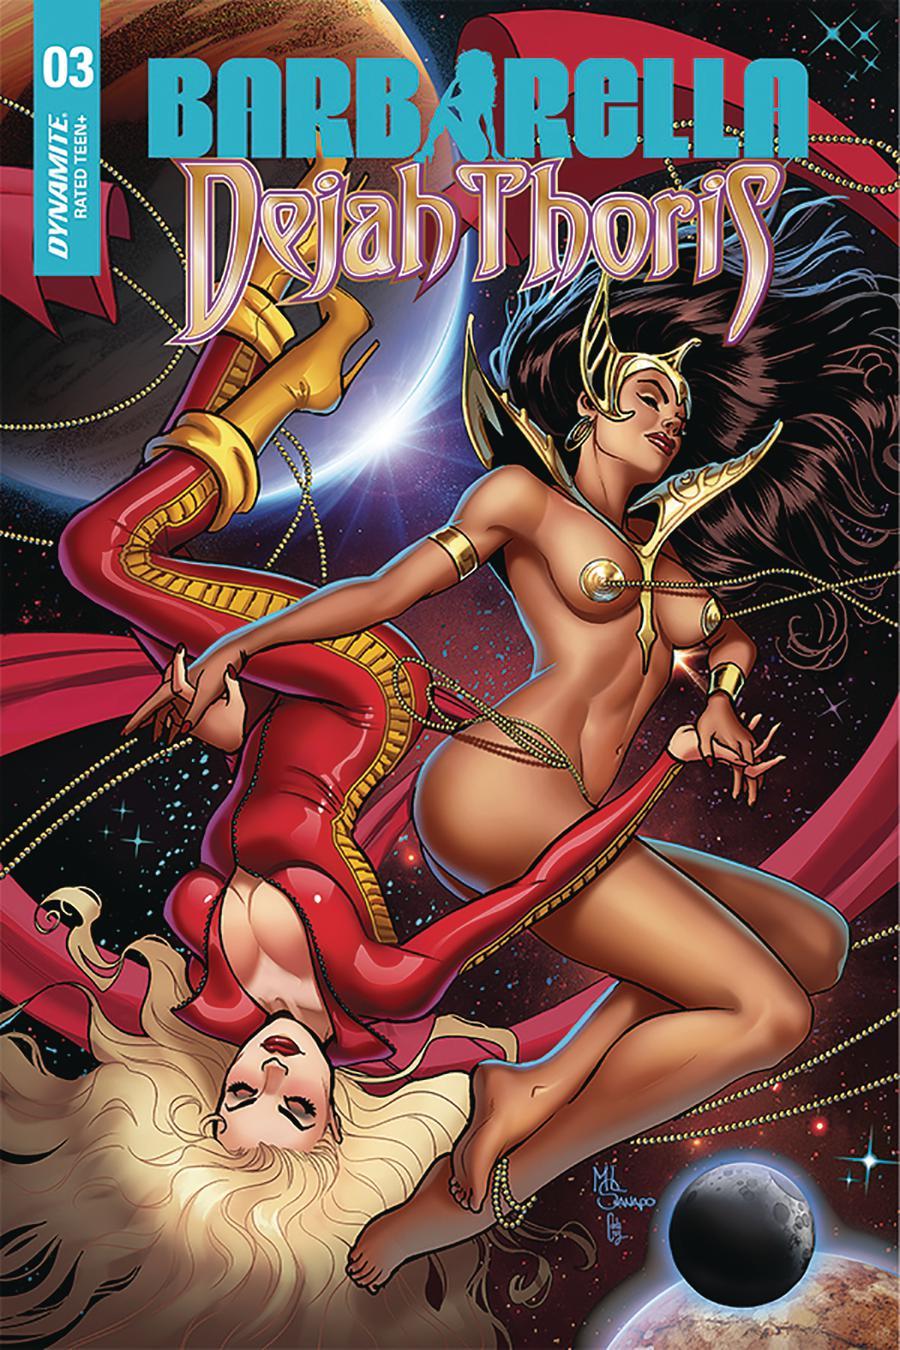 Barbarella Dejah Thoris #3 Cover F Incentive Maria Sanapo Seduction Variant Cover